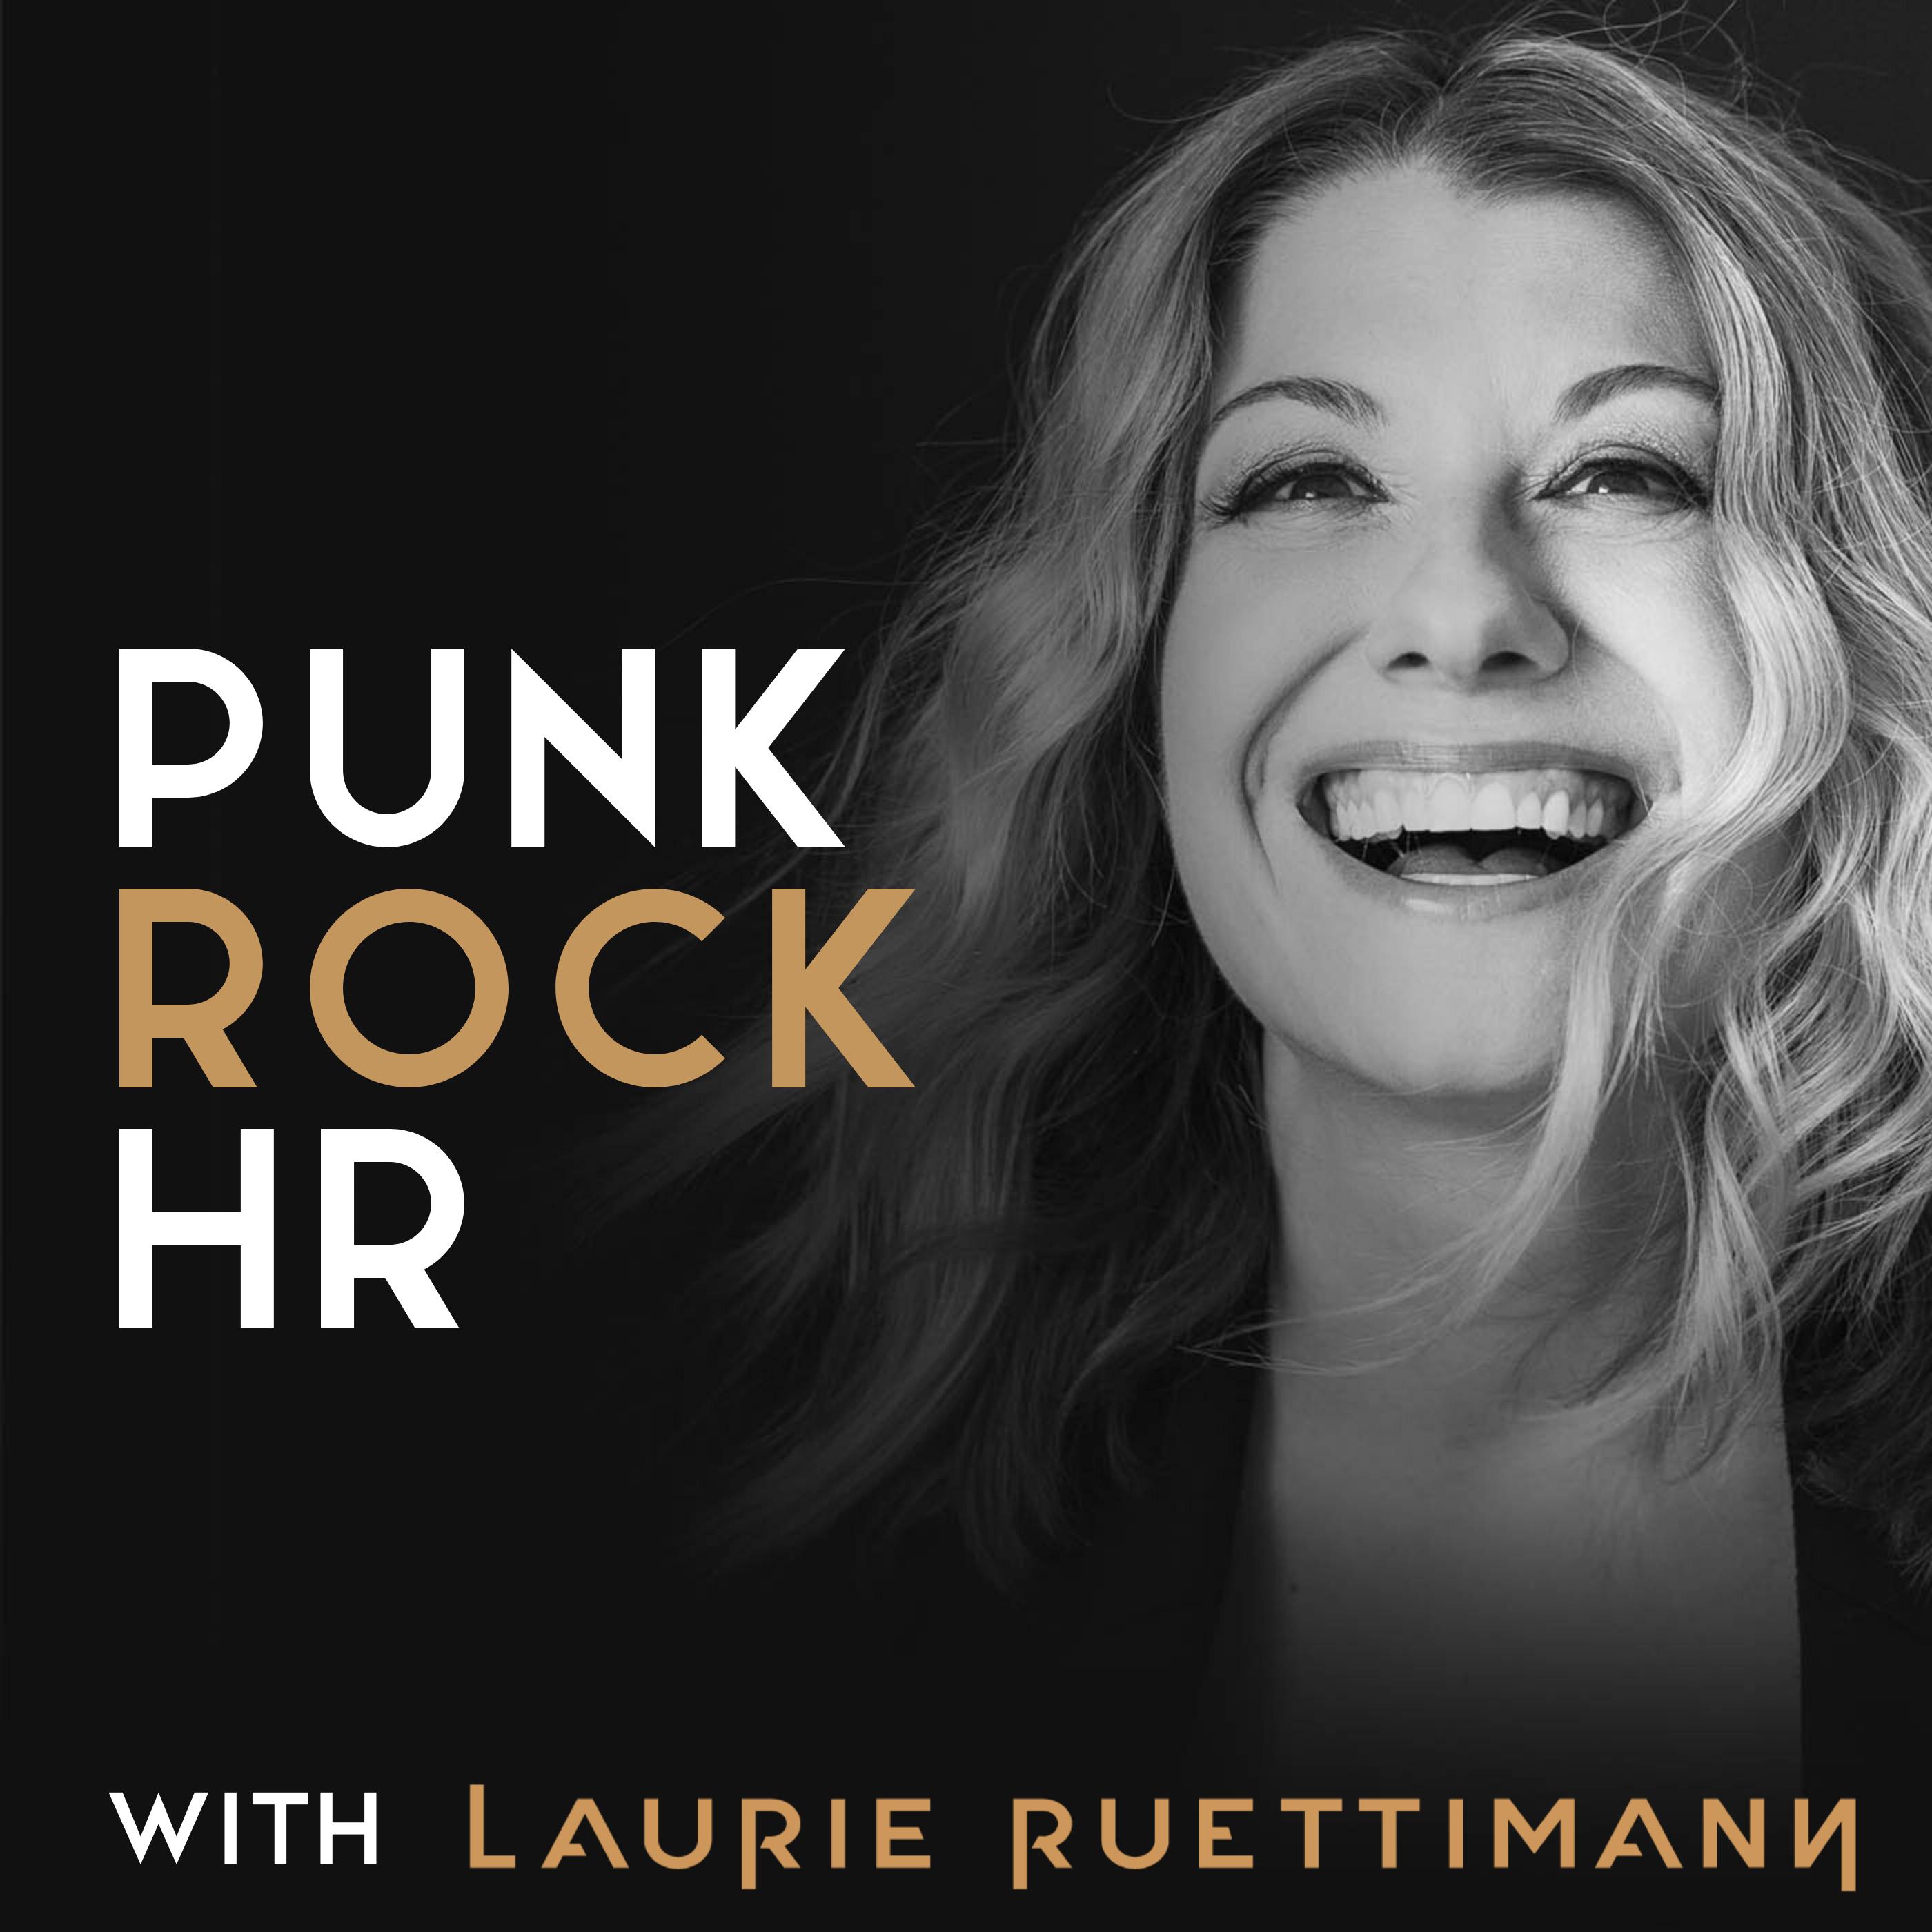 Punk Rock HR